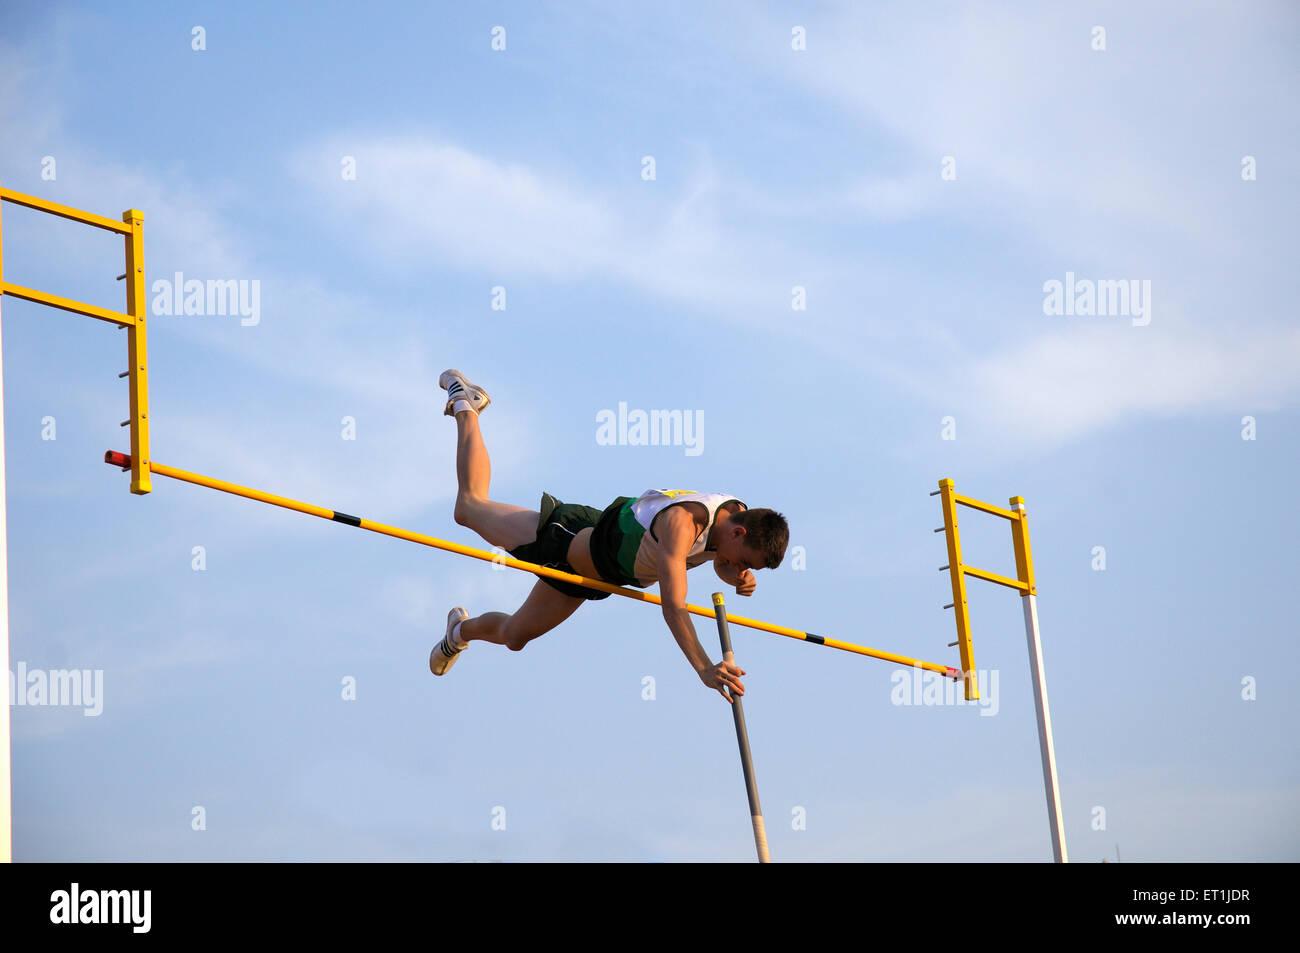 Atleta di tentare la pole vault jump ; Pune ; Maharashtra ; India 15 ottobre 2008 NOMR Immagini Stock